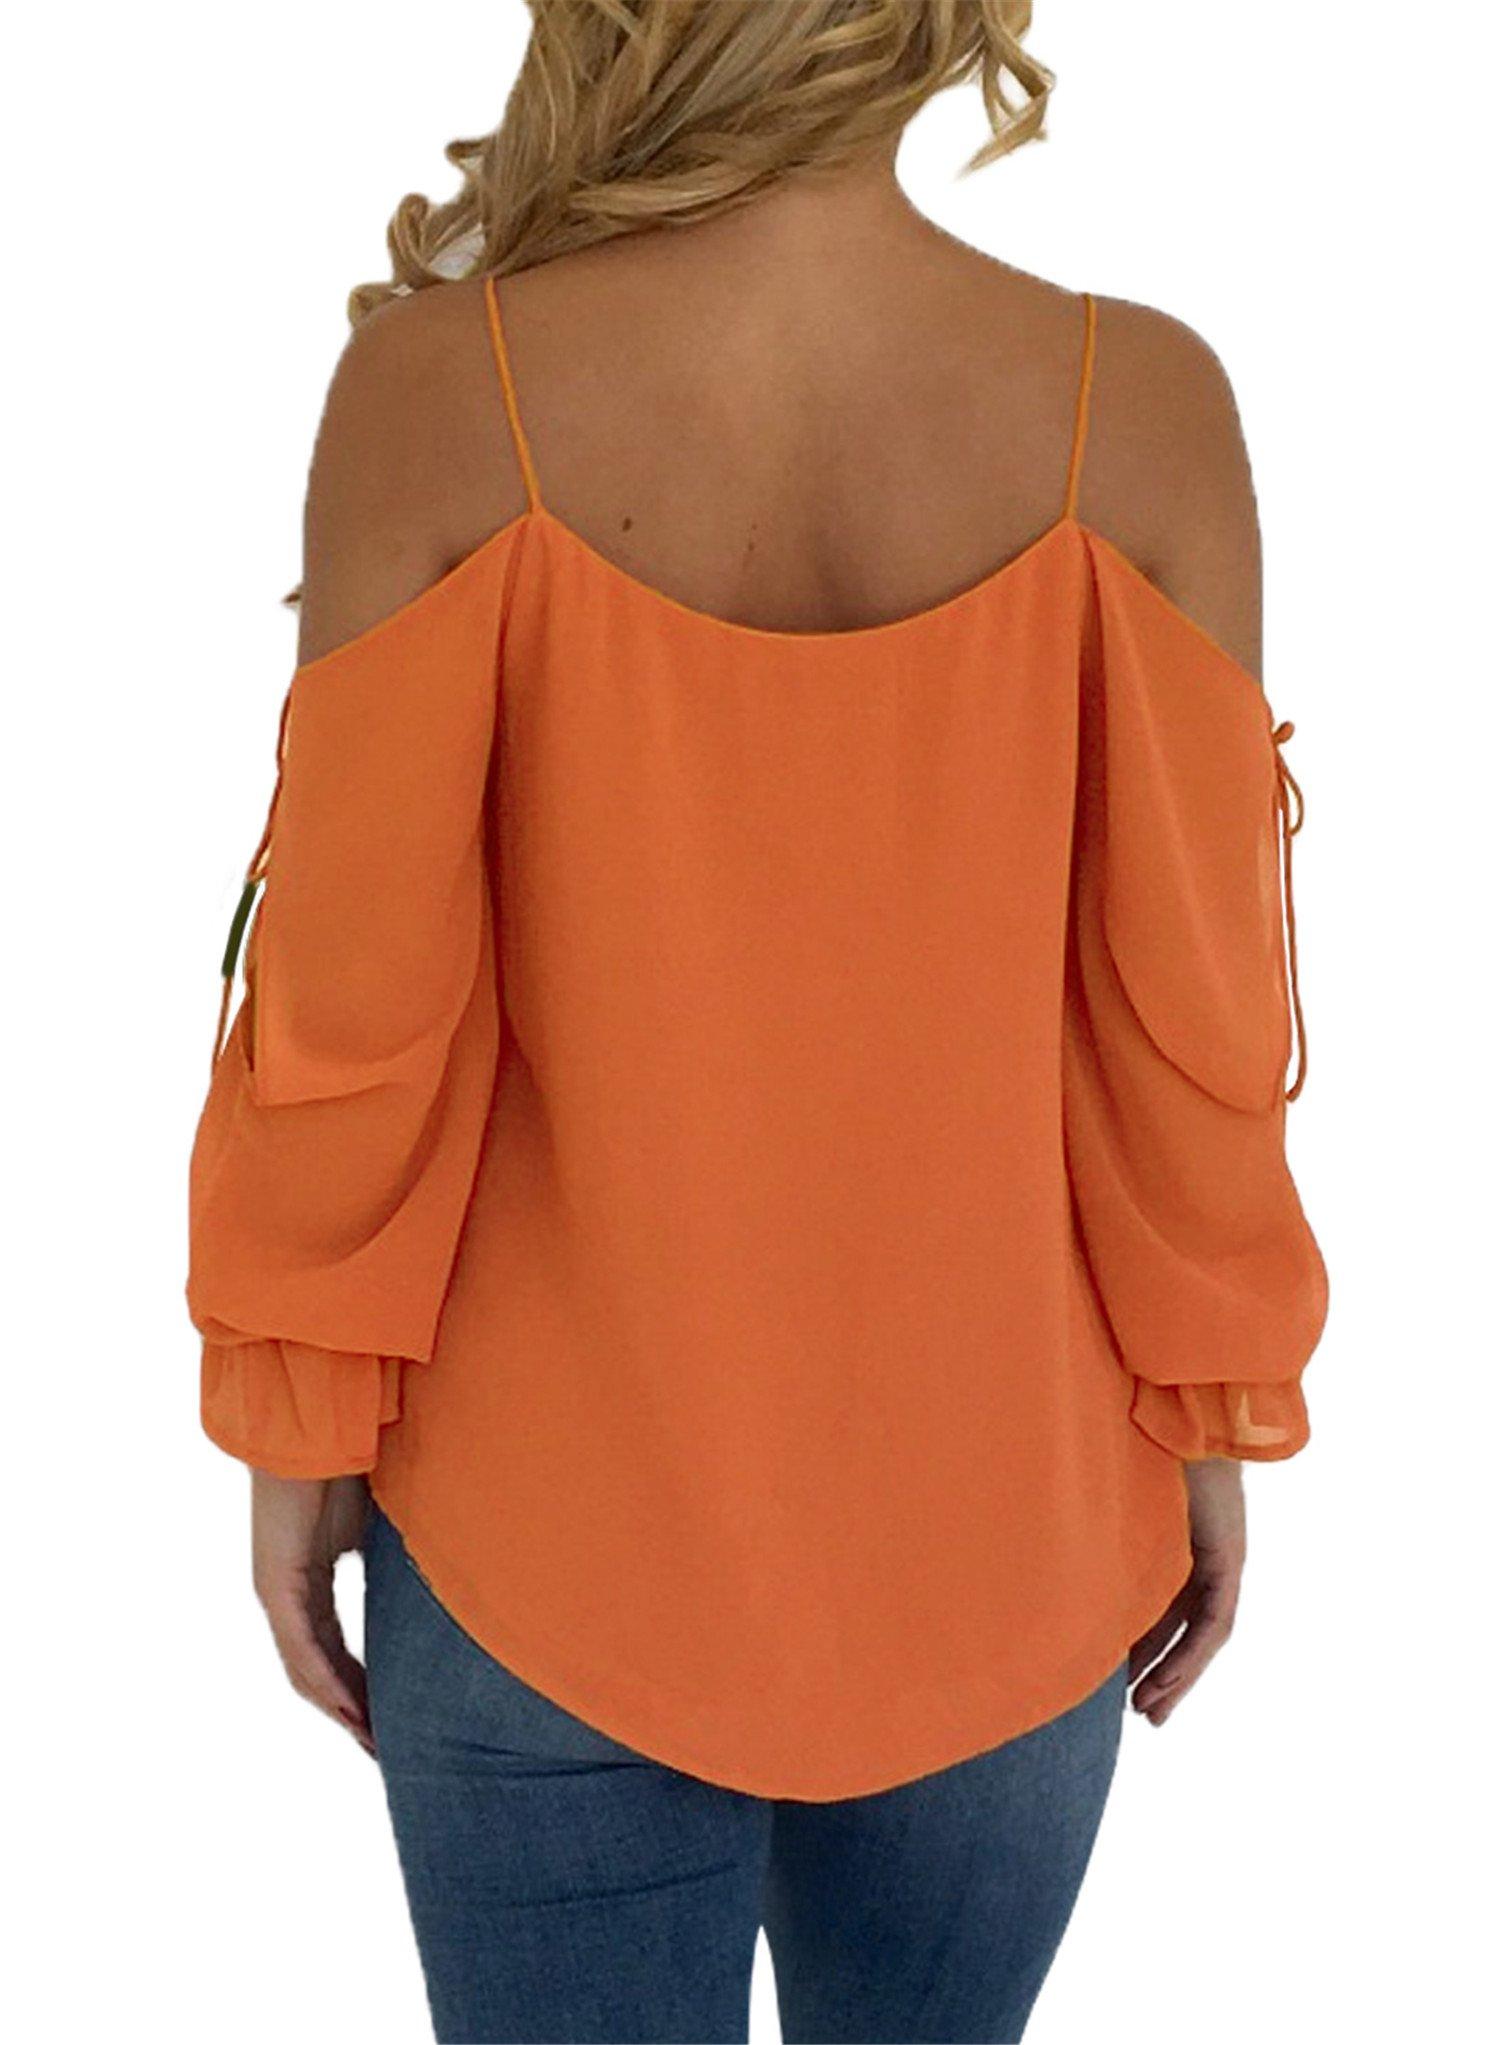 Blibea Womens Spaghetti Strap Loose T Shirts Off Shoulder Blouse Long Flared Ruffled Sleeve Shirts Elegant Tee Tops Medium Orange by Blibea (Image #2)